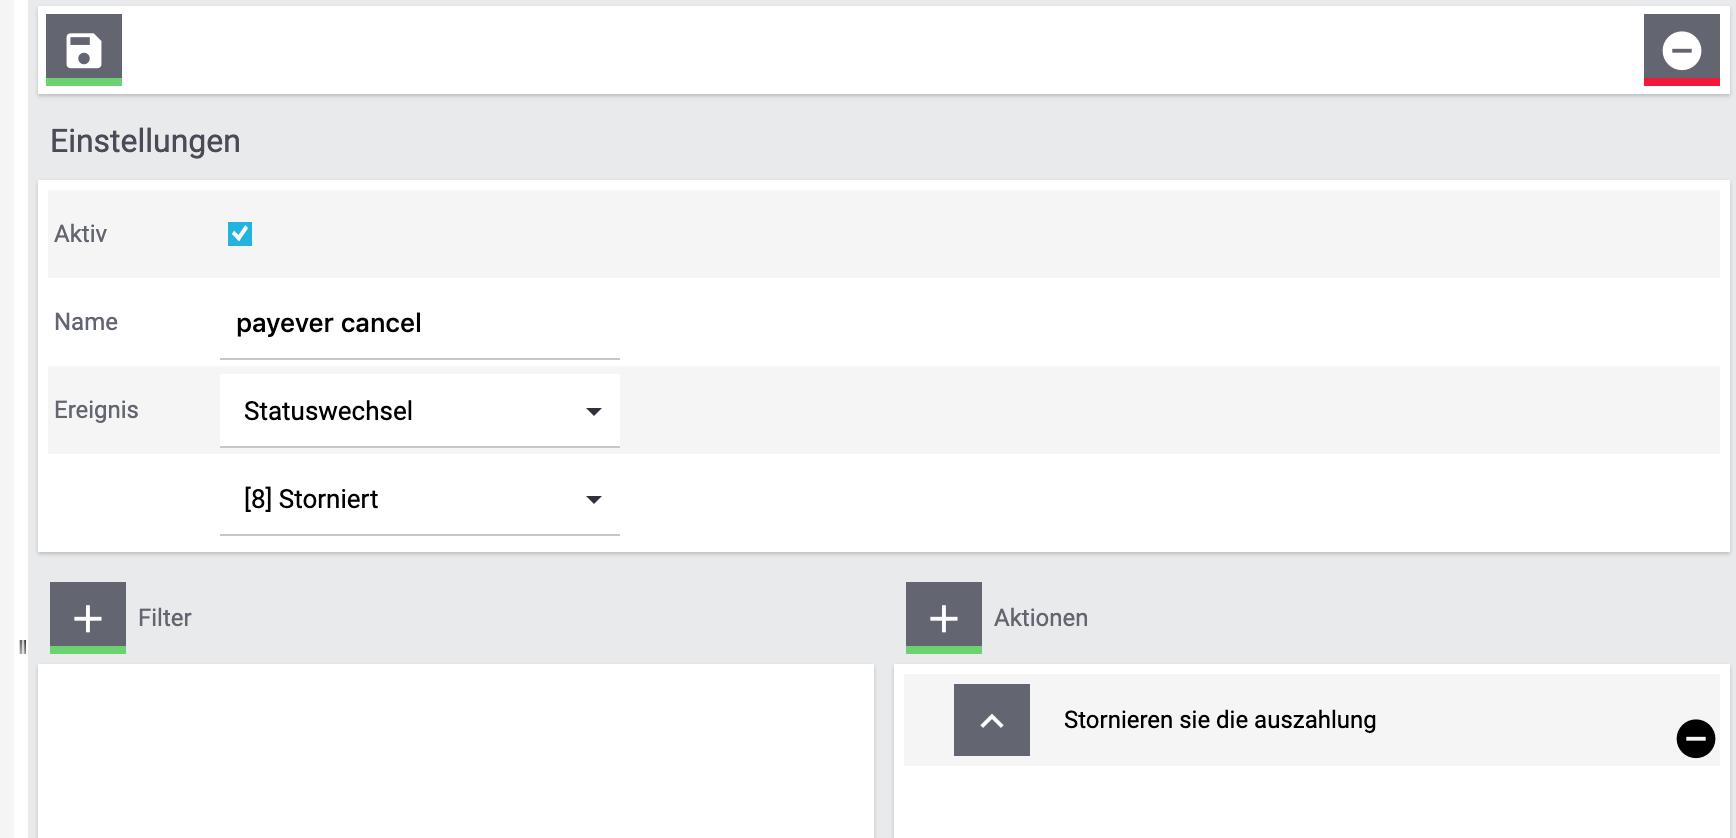 Screenshot_2020-05-11_um_18.27.44.png